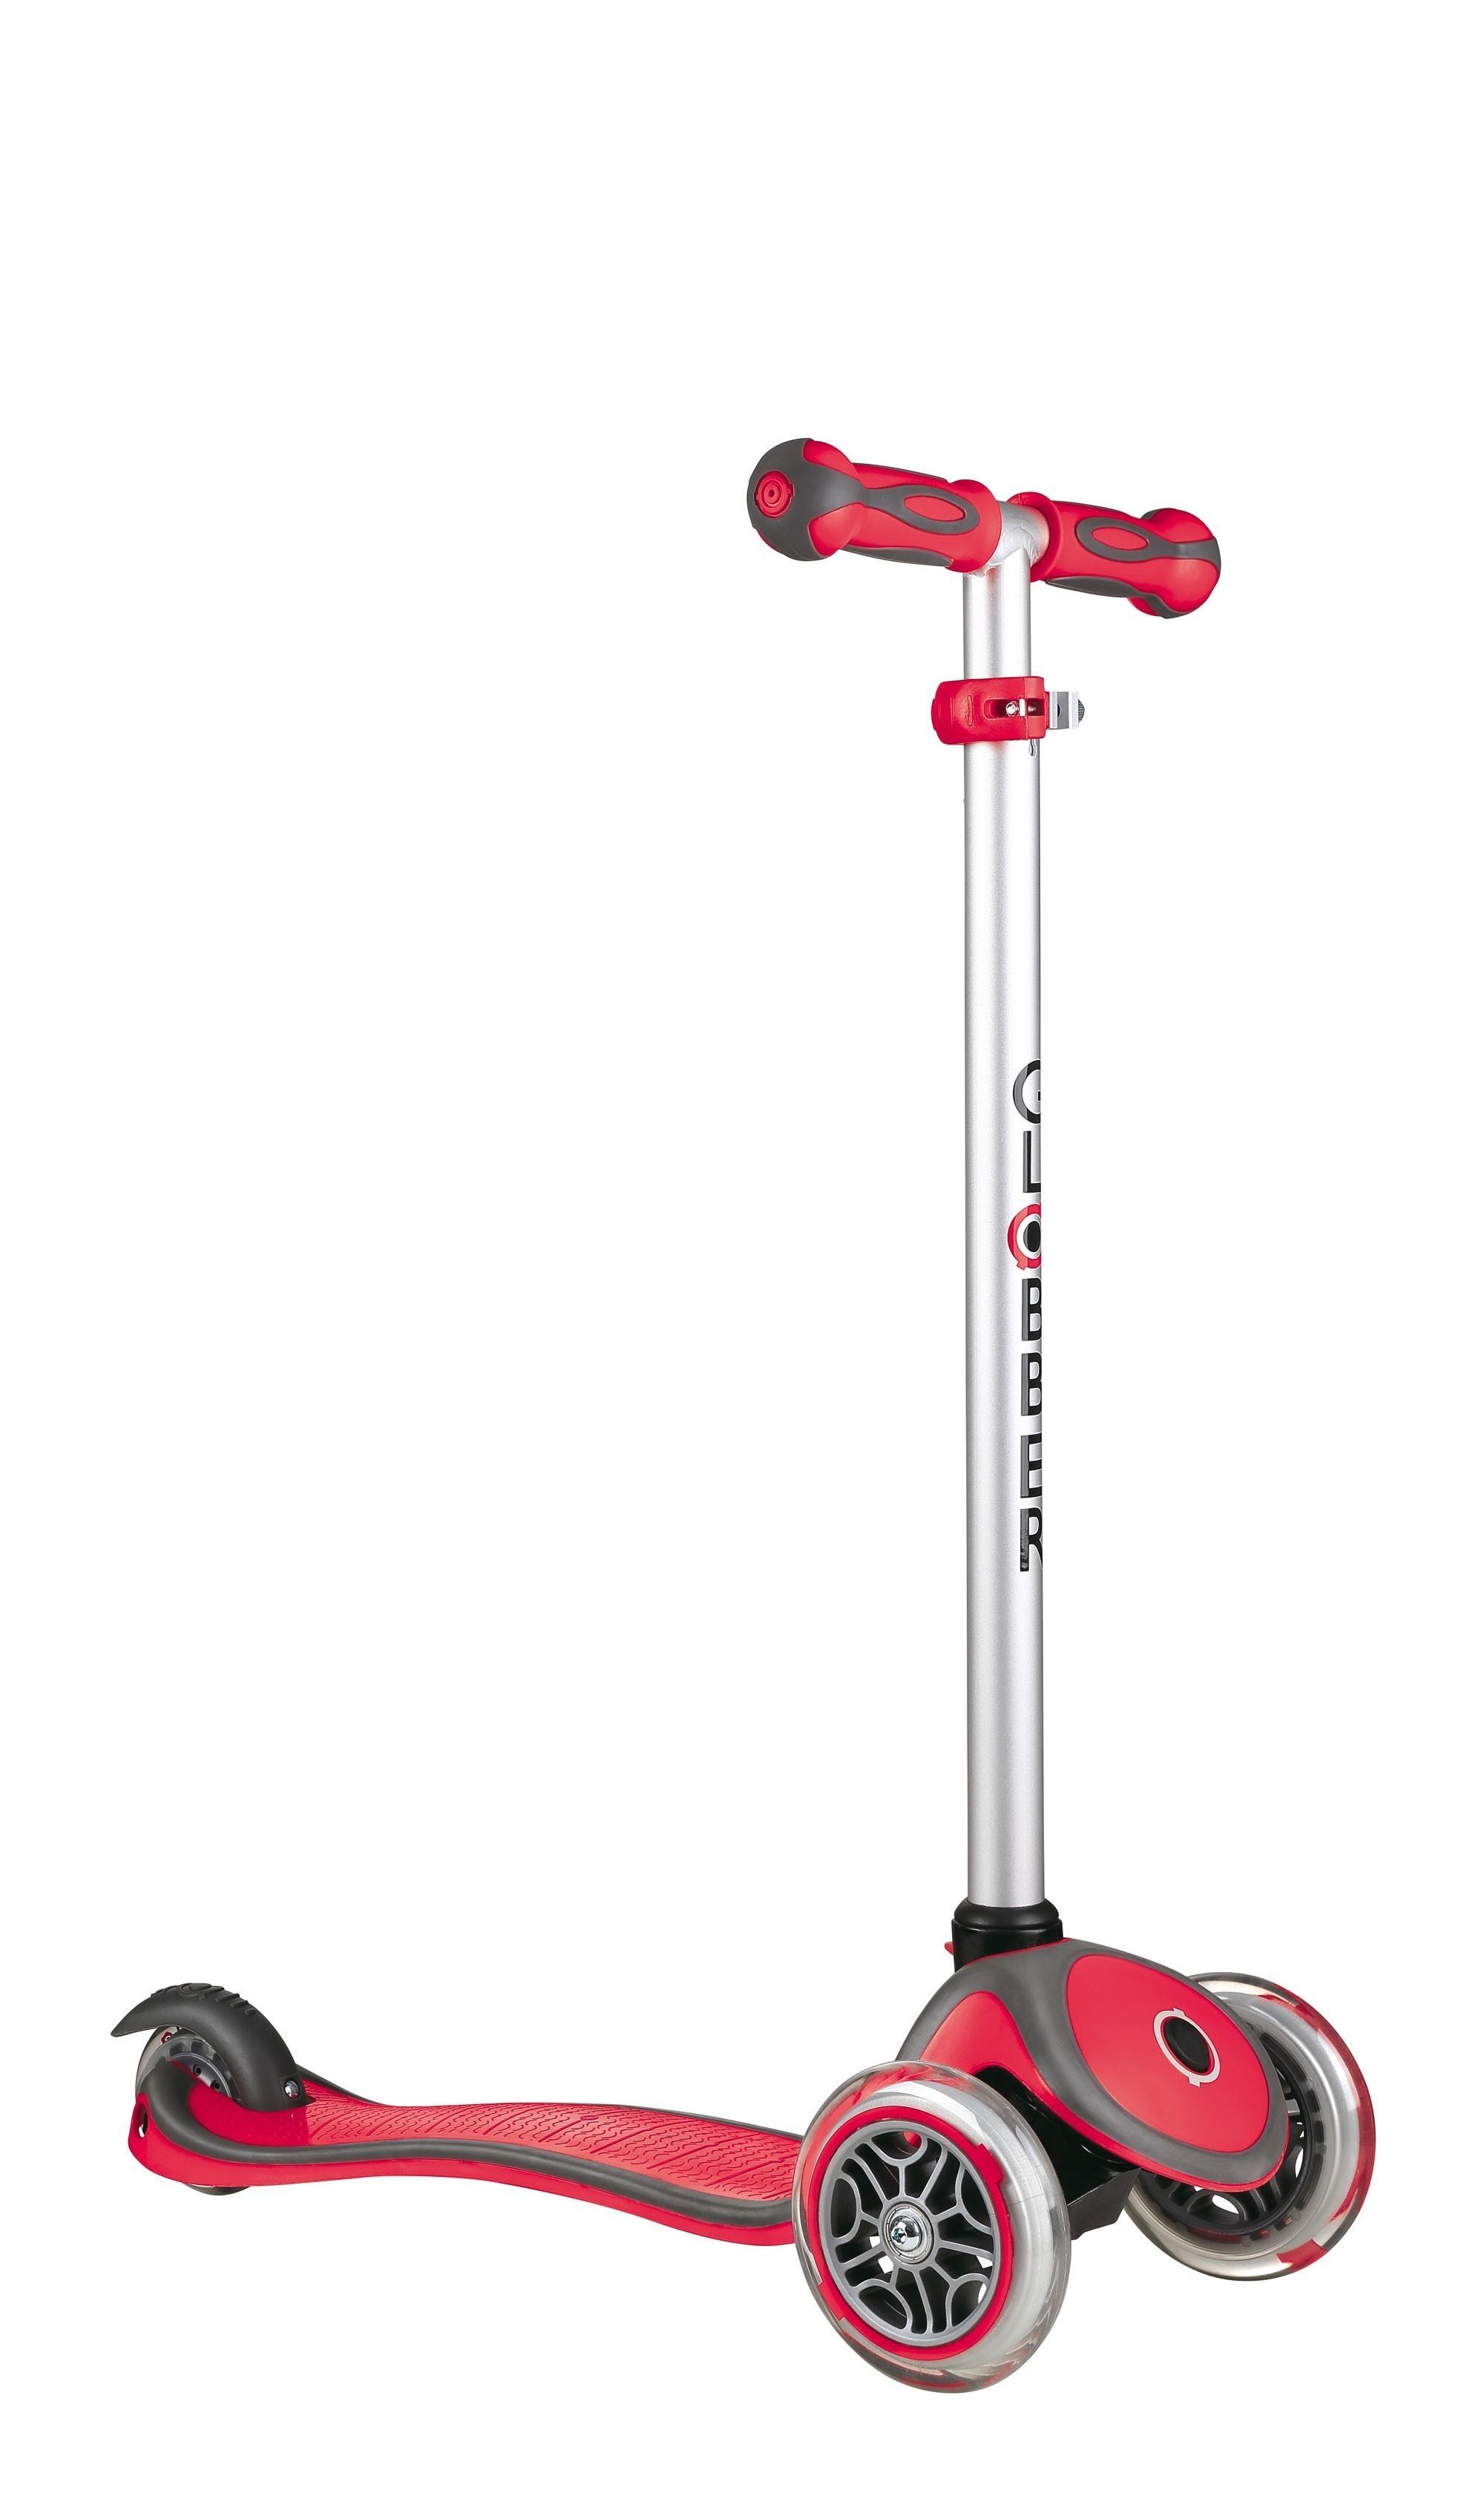 Scooter Kinderroller Dreirad Laufrad Globber Evo Comfort 5in1 rot Bild 3